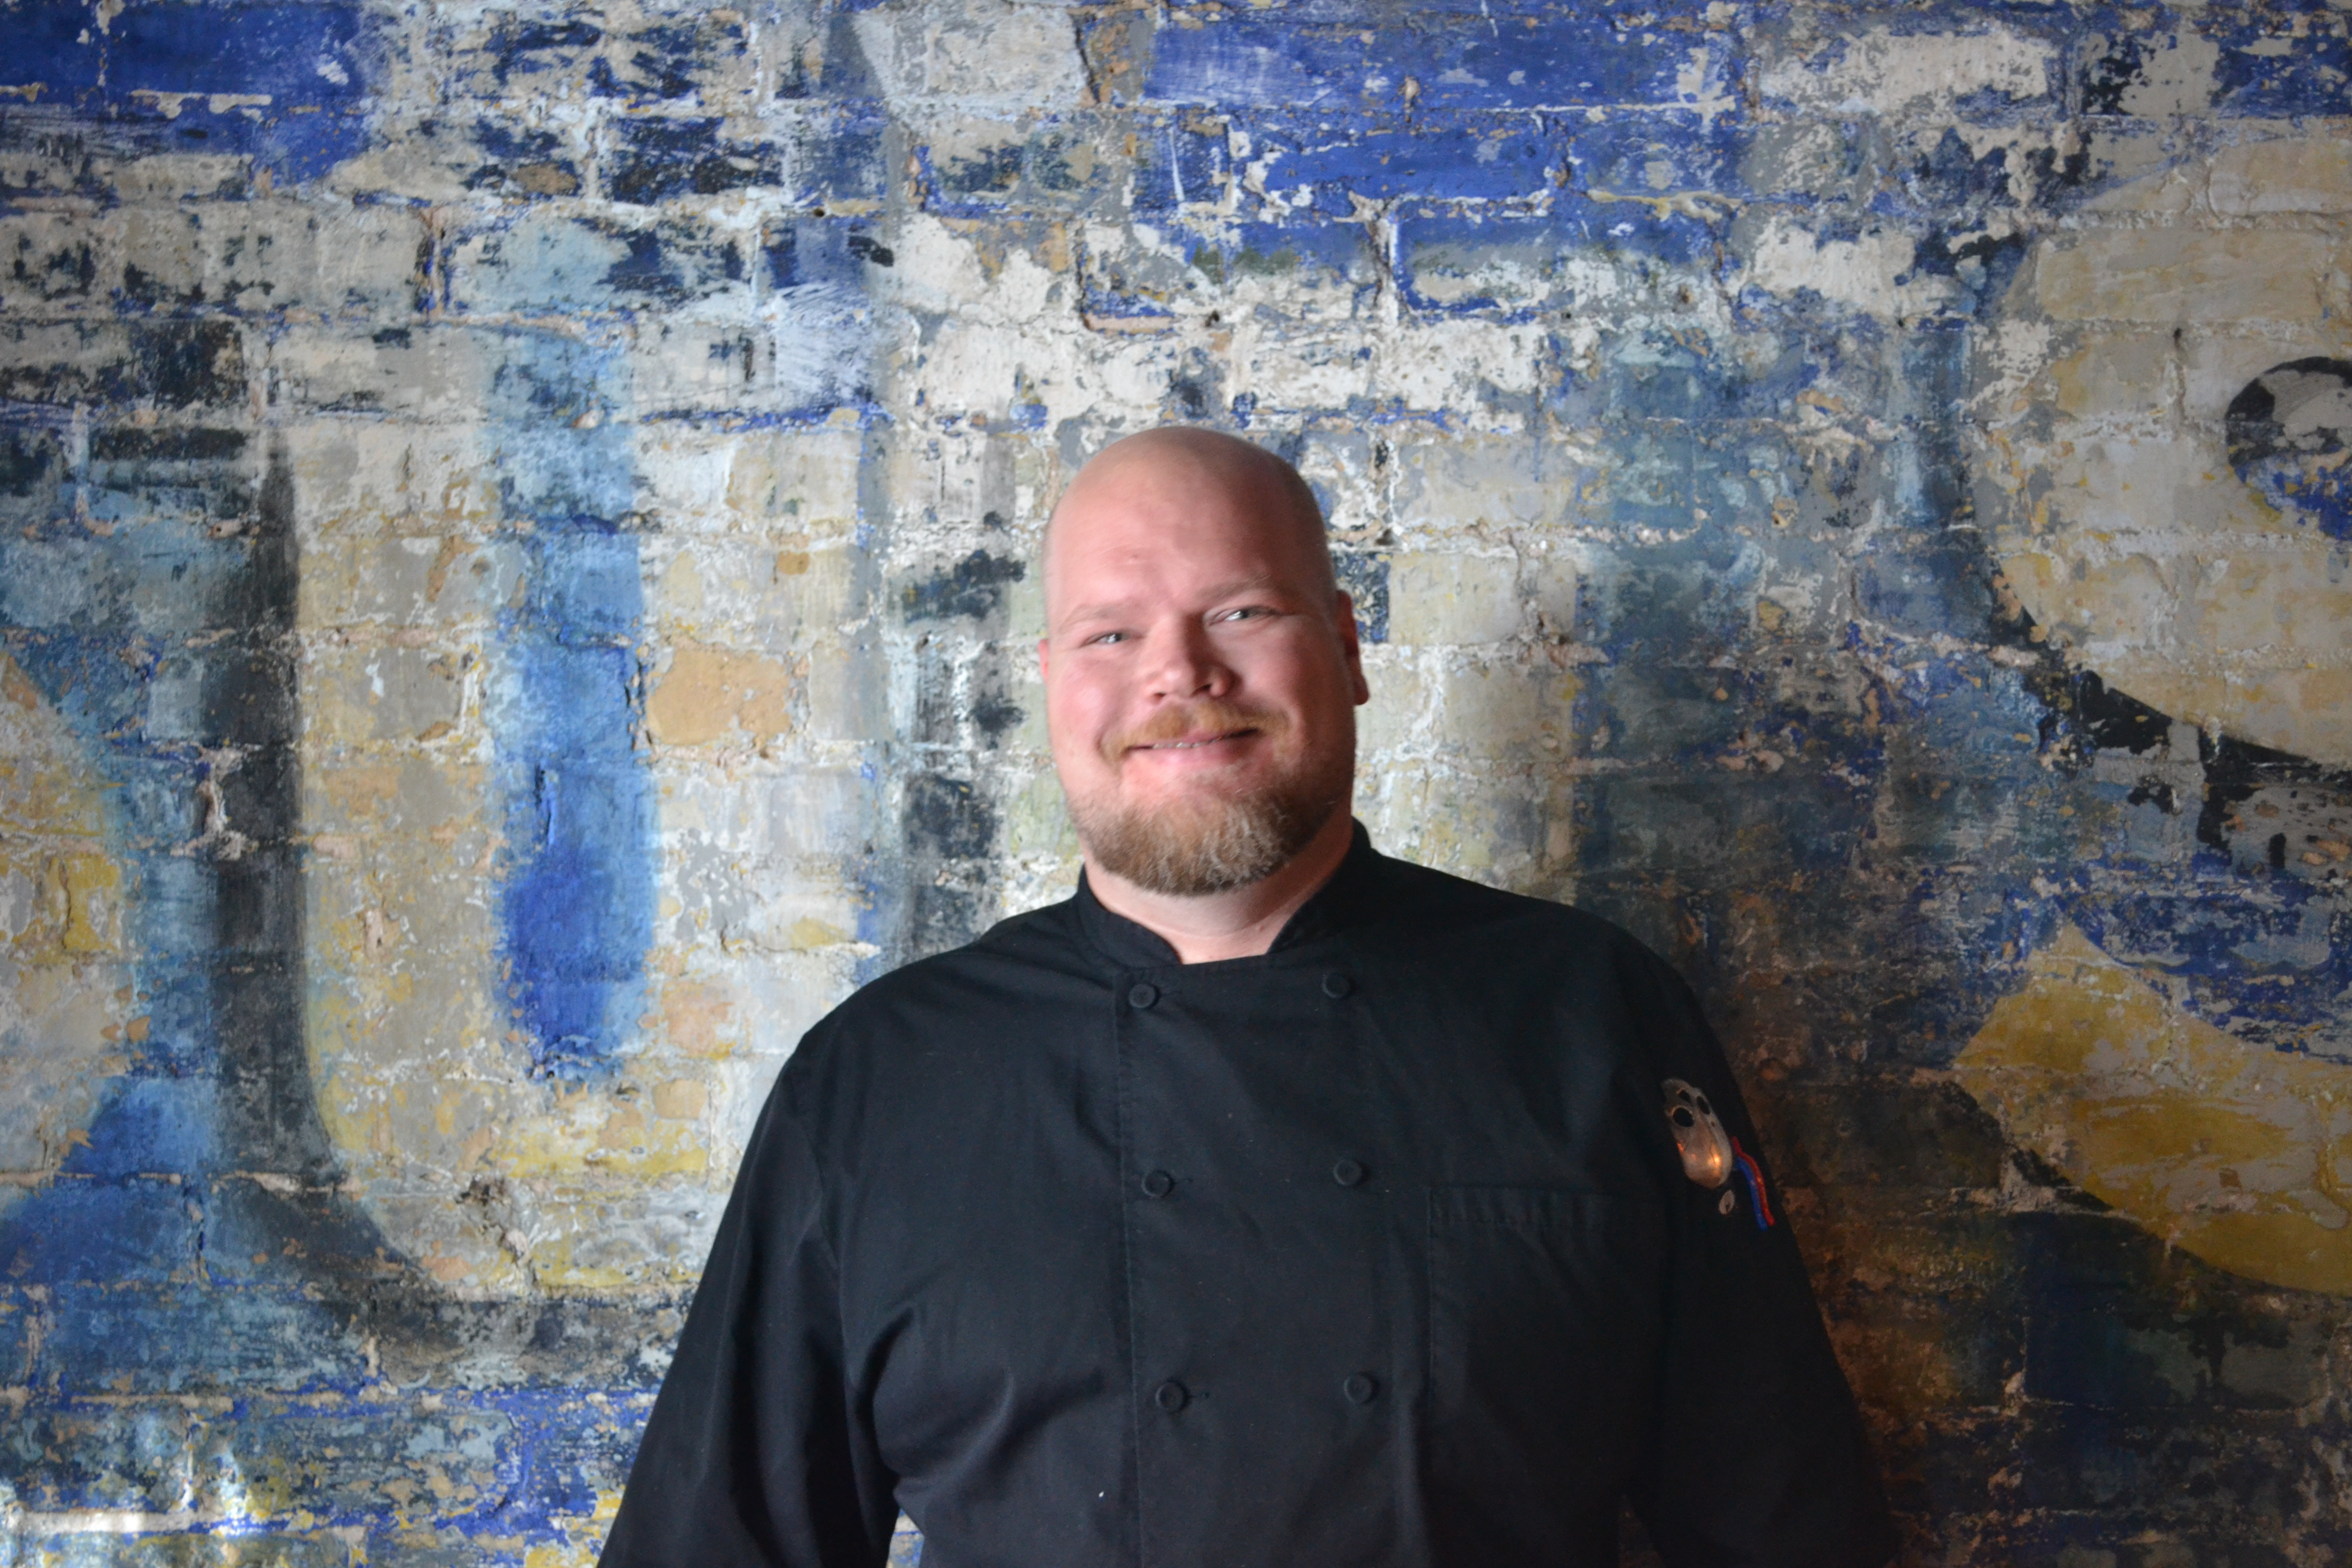 Swift's Attic chef Zack Northcutt